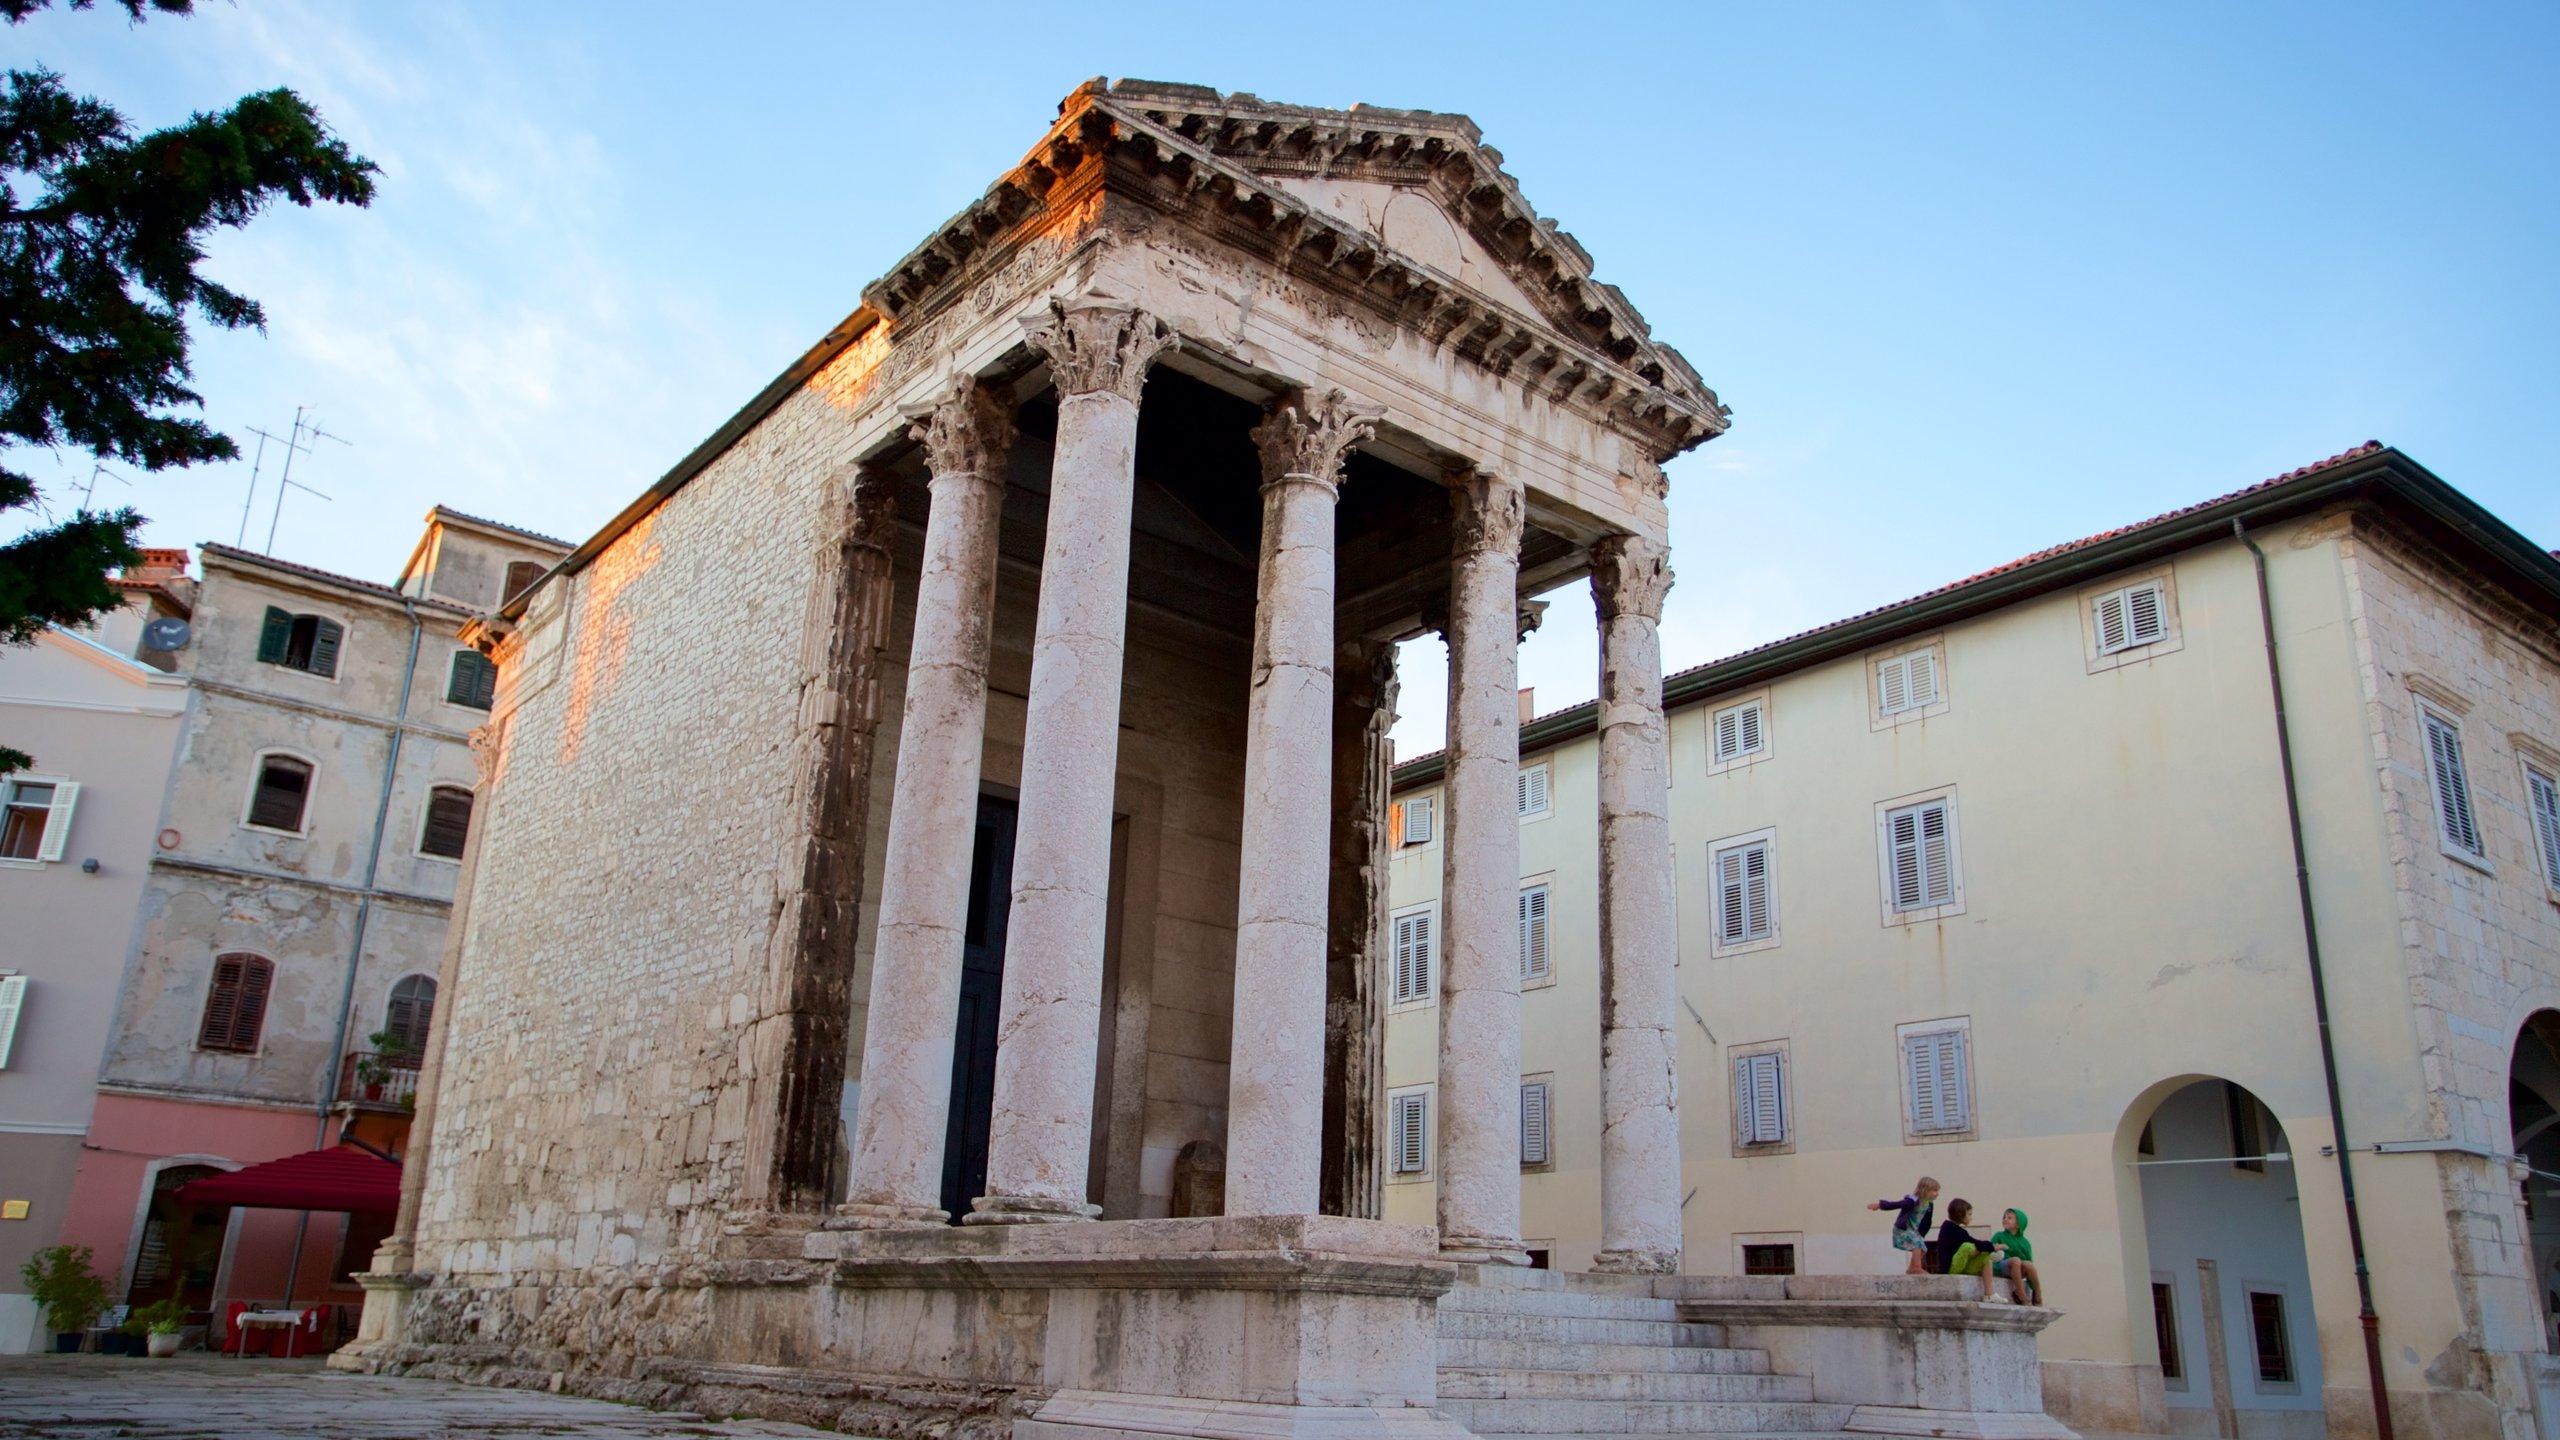 Augustus-Tempel, Pula, Istrien (Bezirk), Kroatien